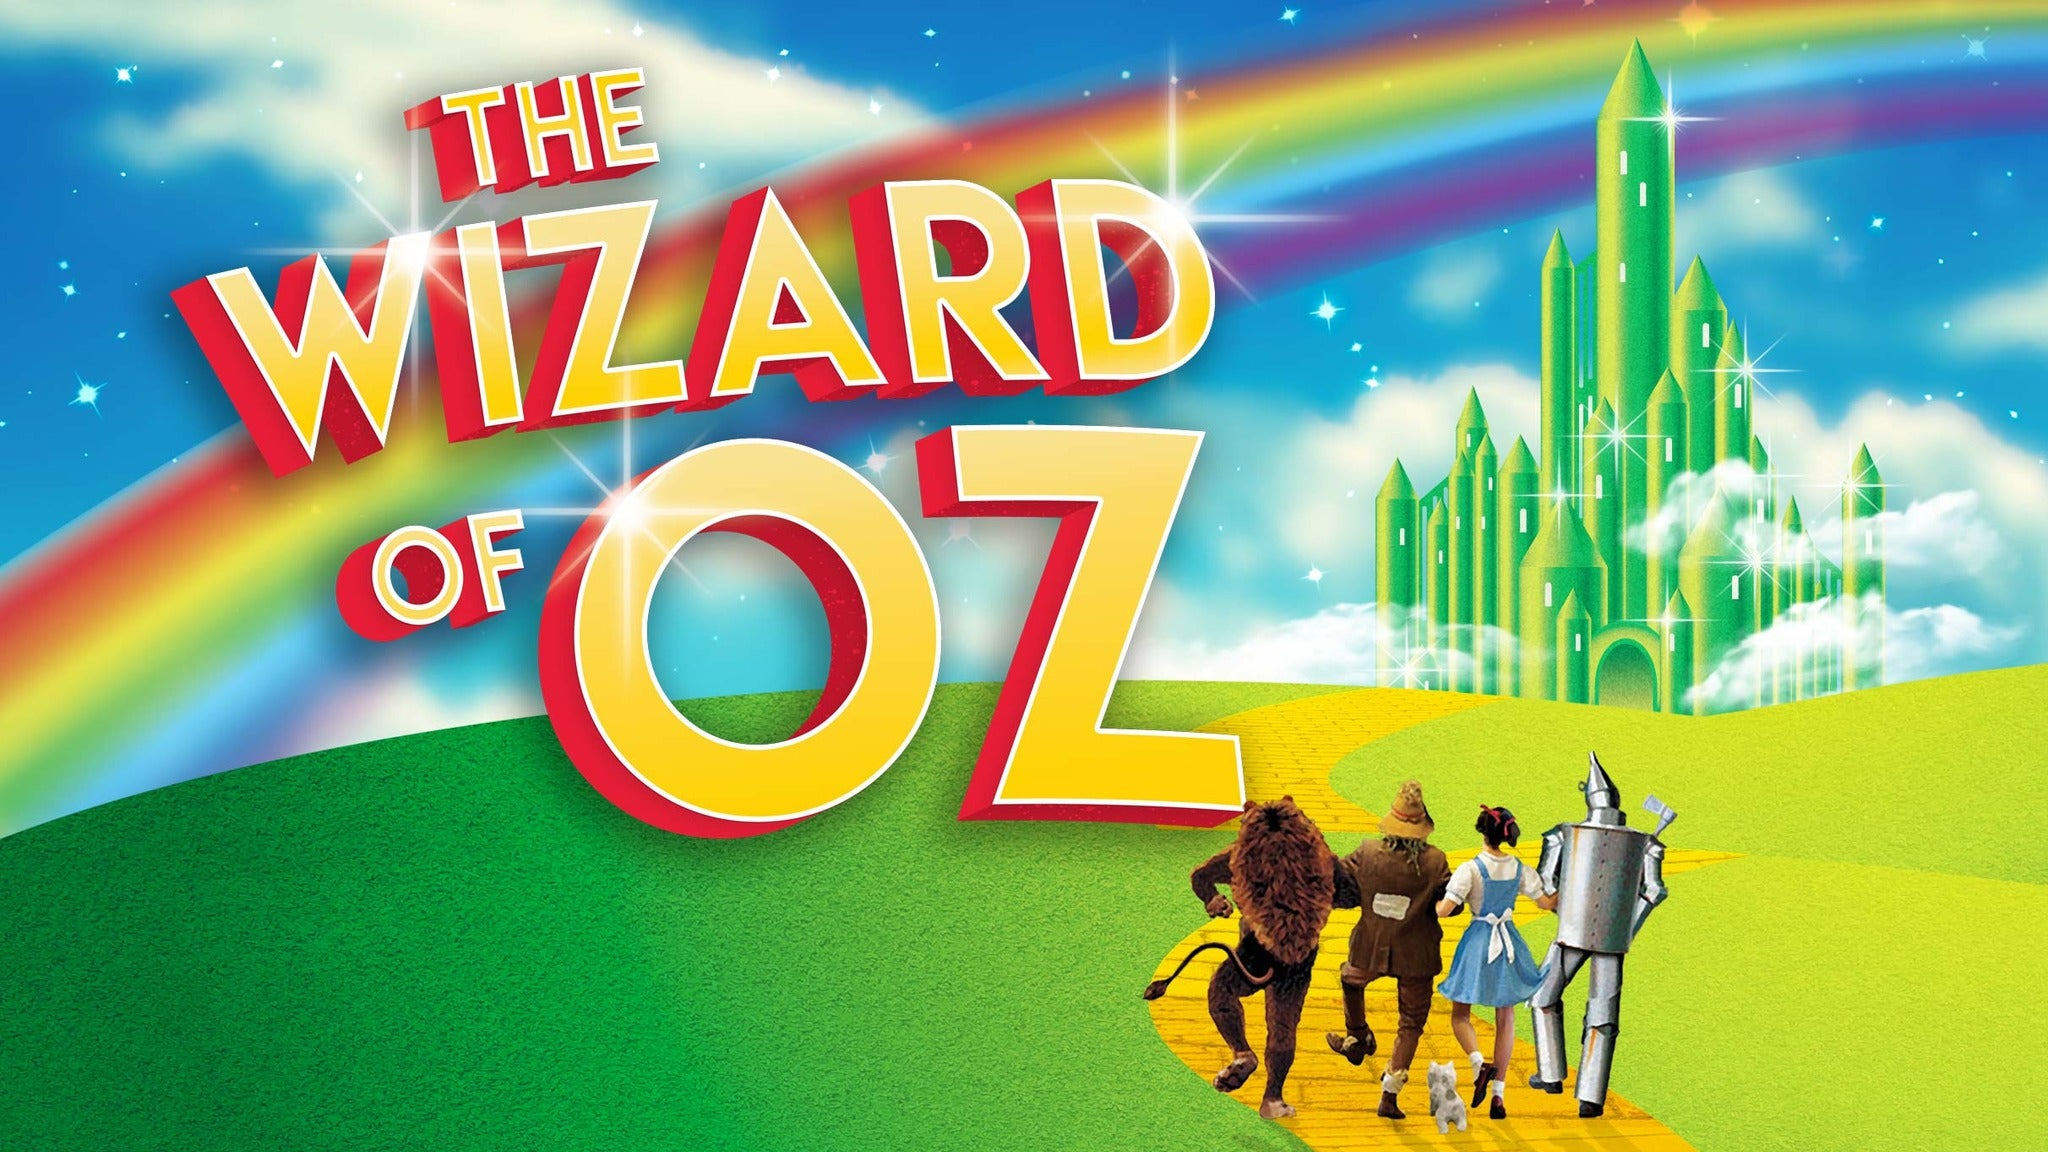 Walnut Street Theatre's The Wizard of Oz